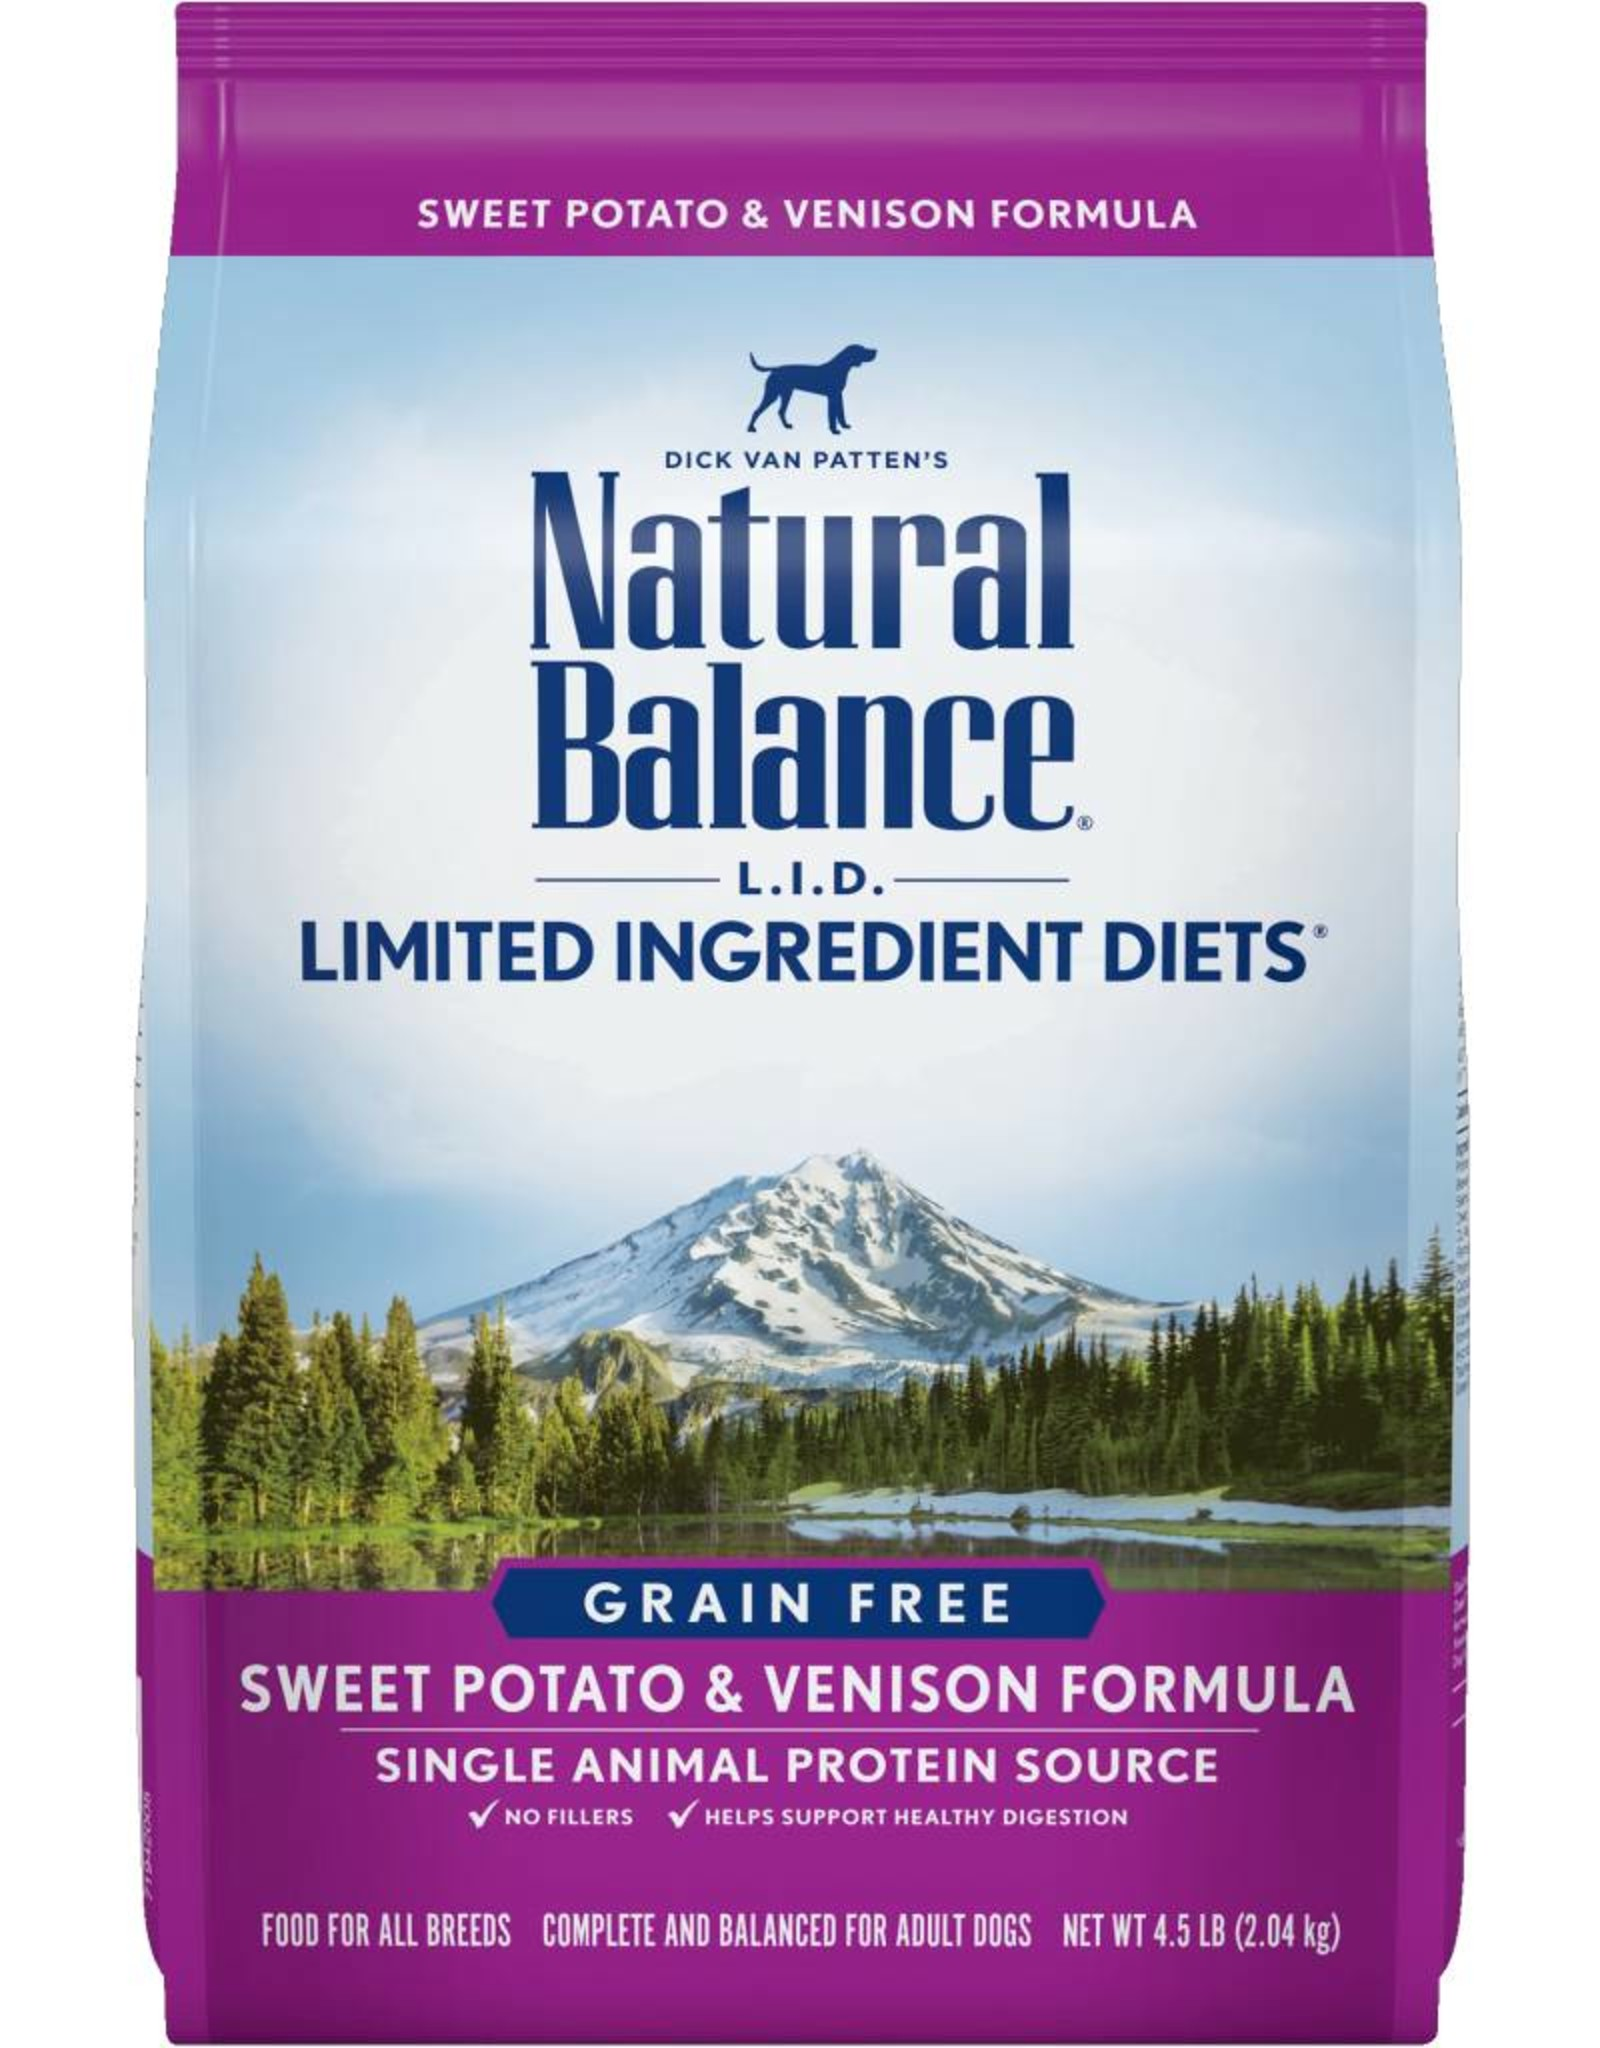 Natural Balance L.I.D. Limited Ingredient Diets Sweet Potato & Venison Formula Grain-Free Dry Dog Food